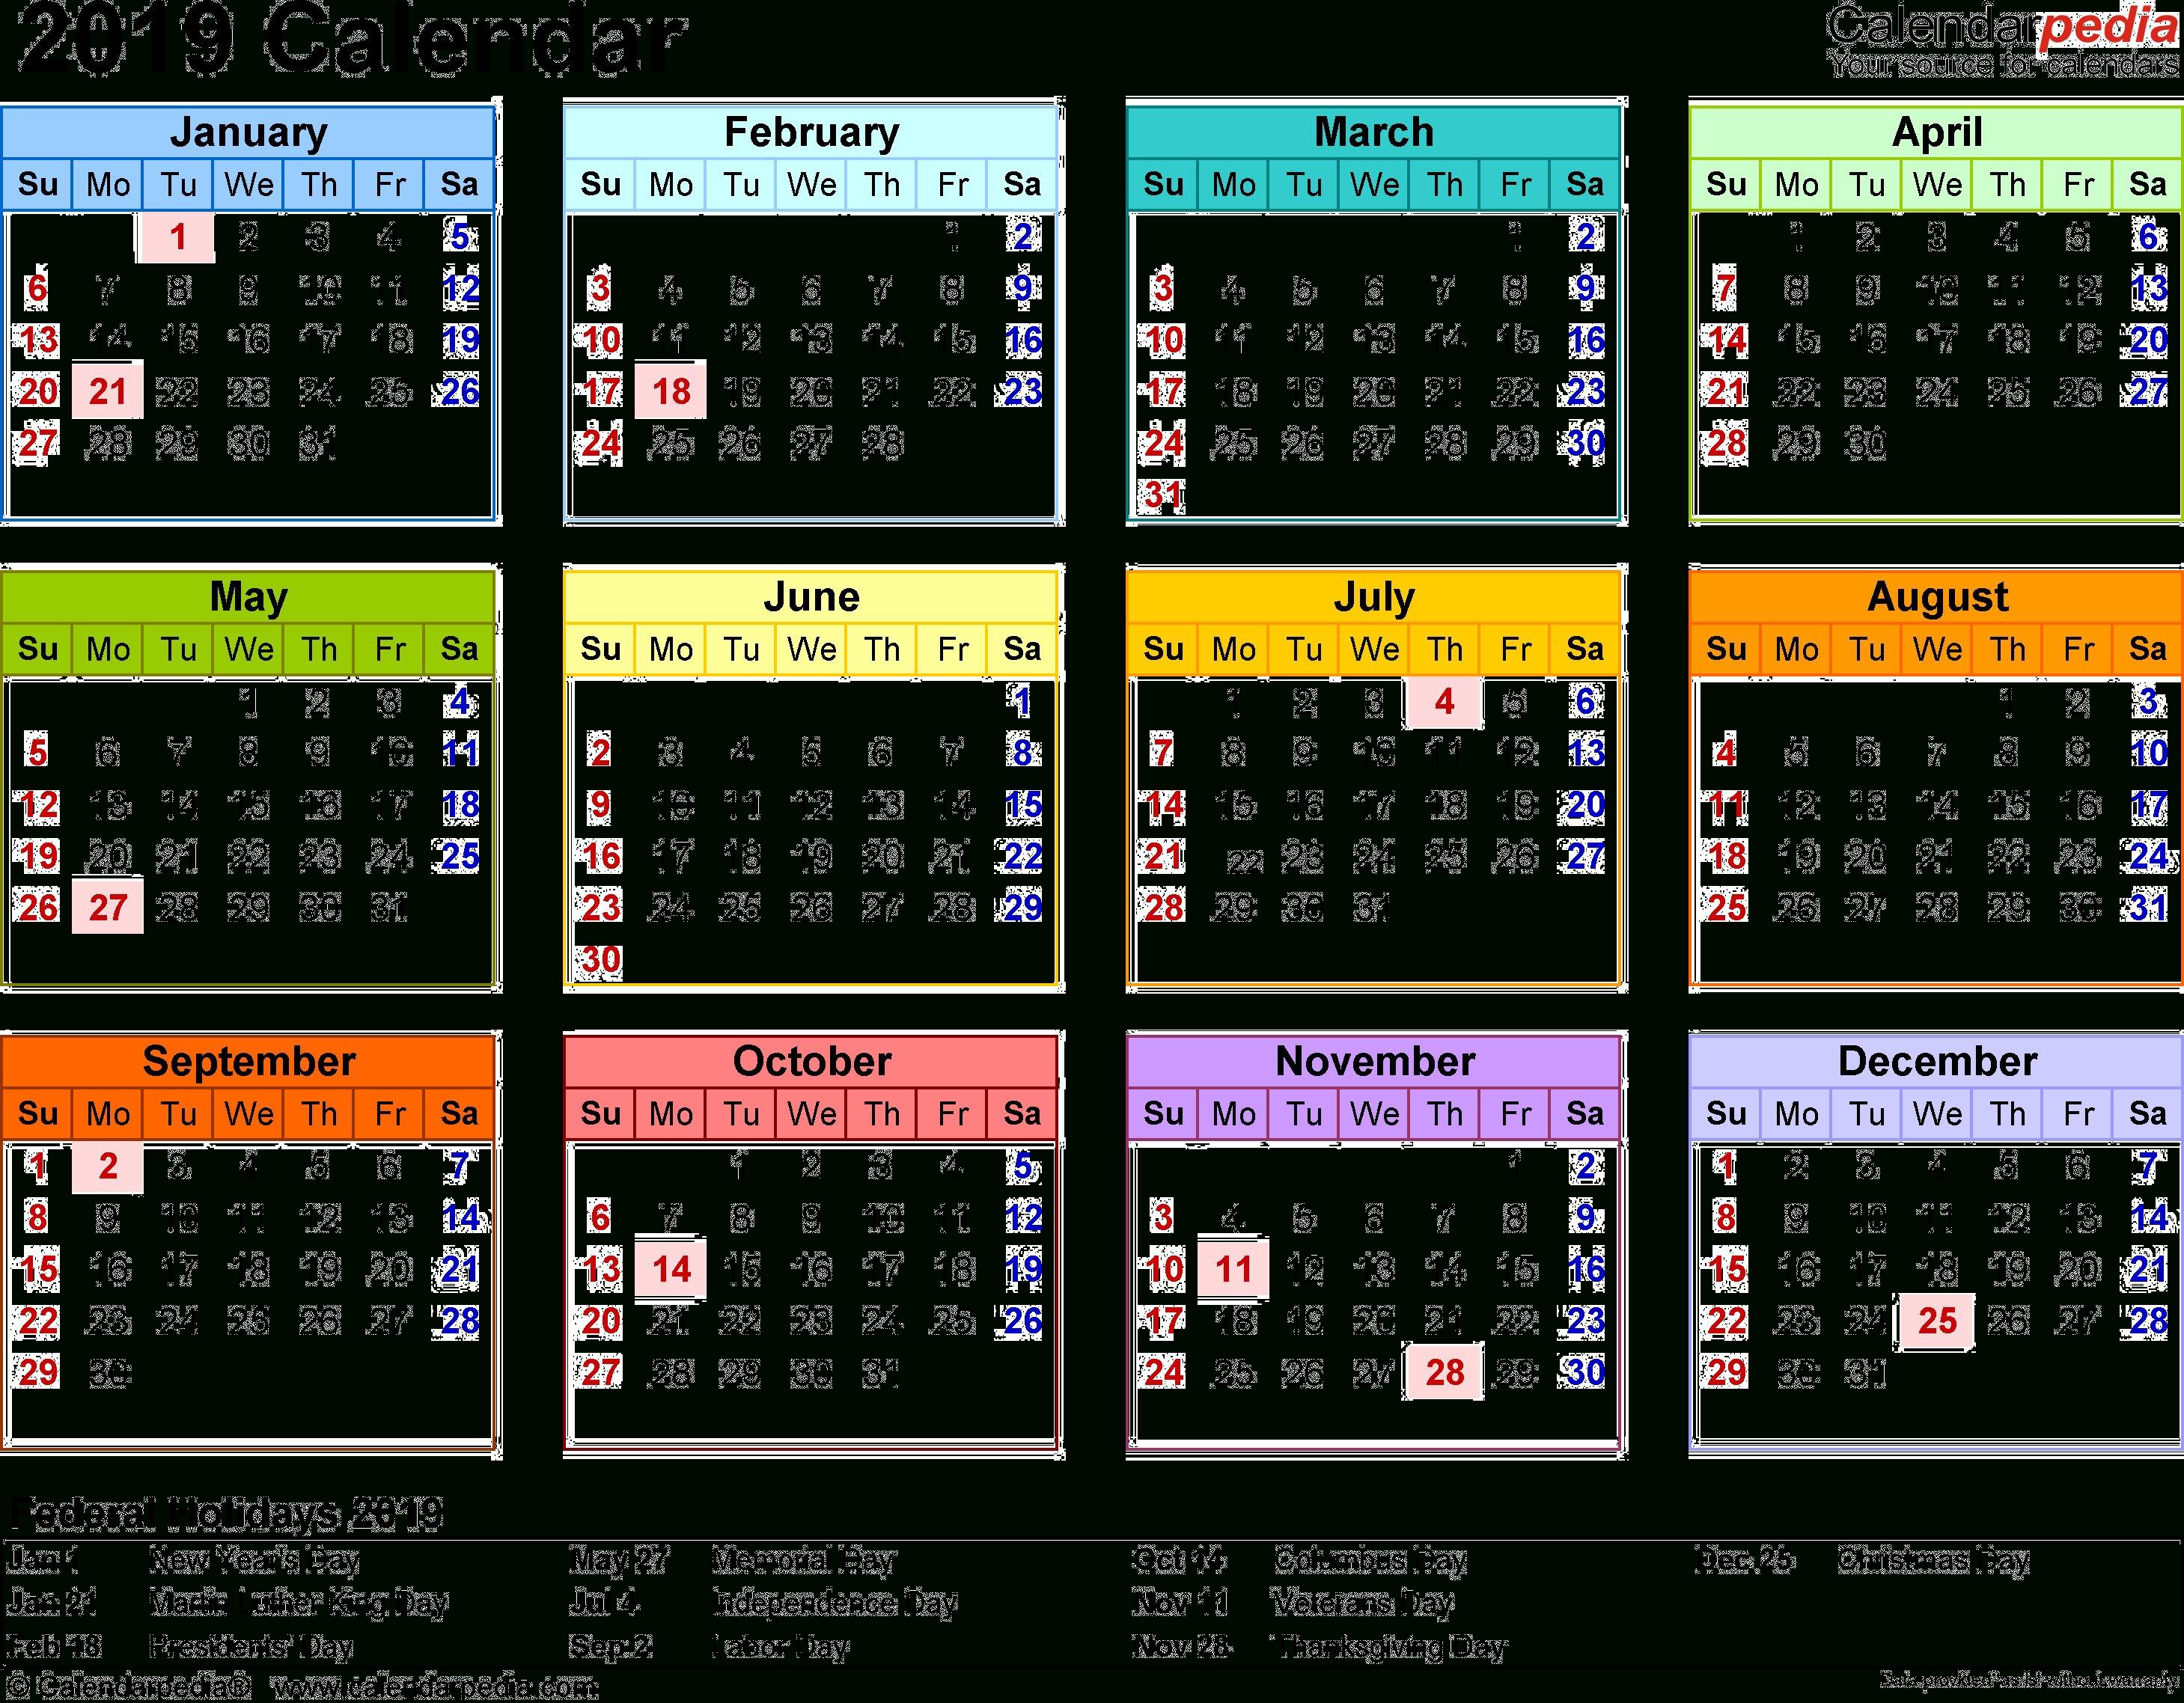 2019 Calendar Png Transparent Images | Png All Calendar 2019 Png